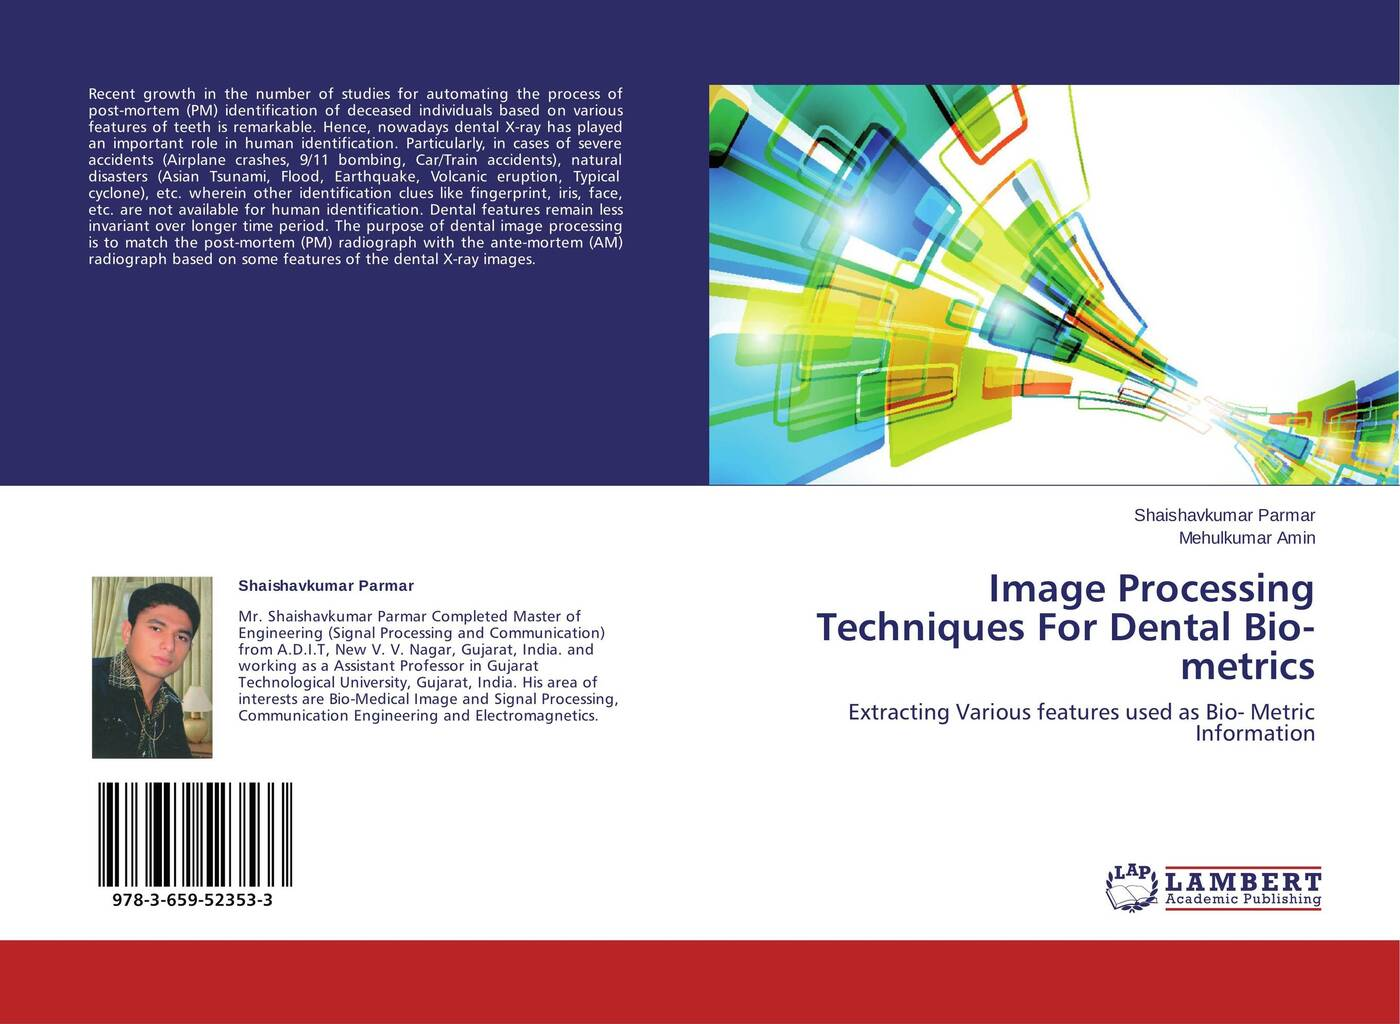 Shaishavkumar Parmar and Mehulkumar Amin Image Processing Techniques For Dental Bio-metrics digital dental sensor rvg with twain driver dental x ray sensor ateco dental x ray image sensor